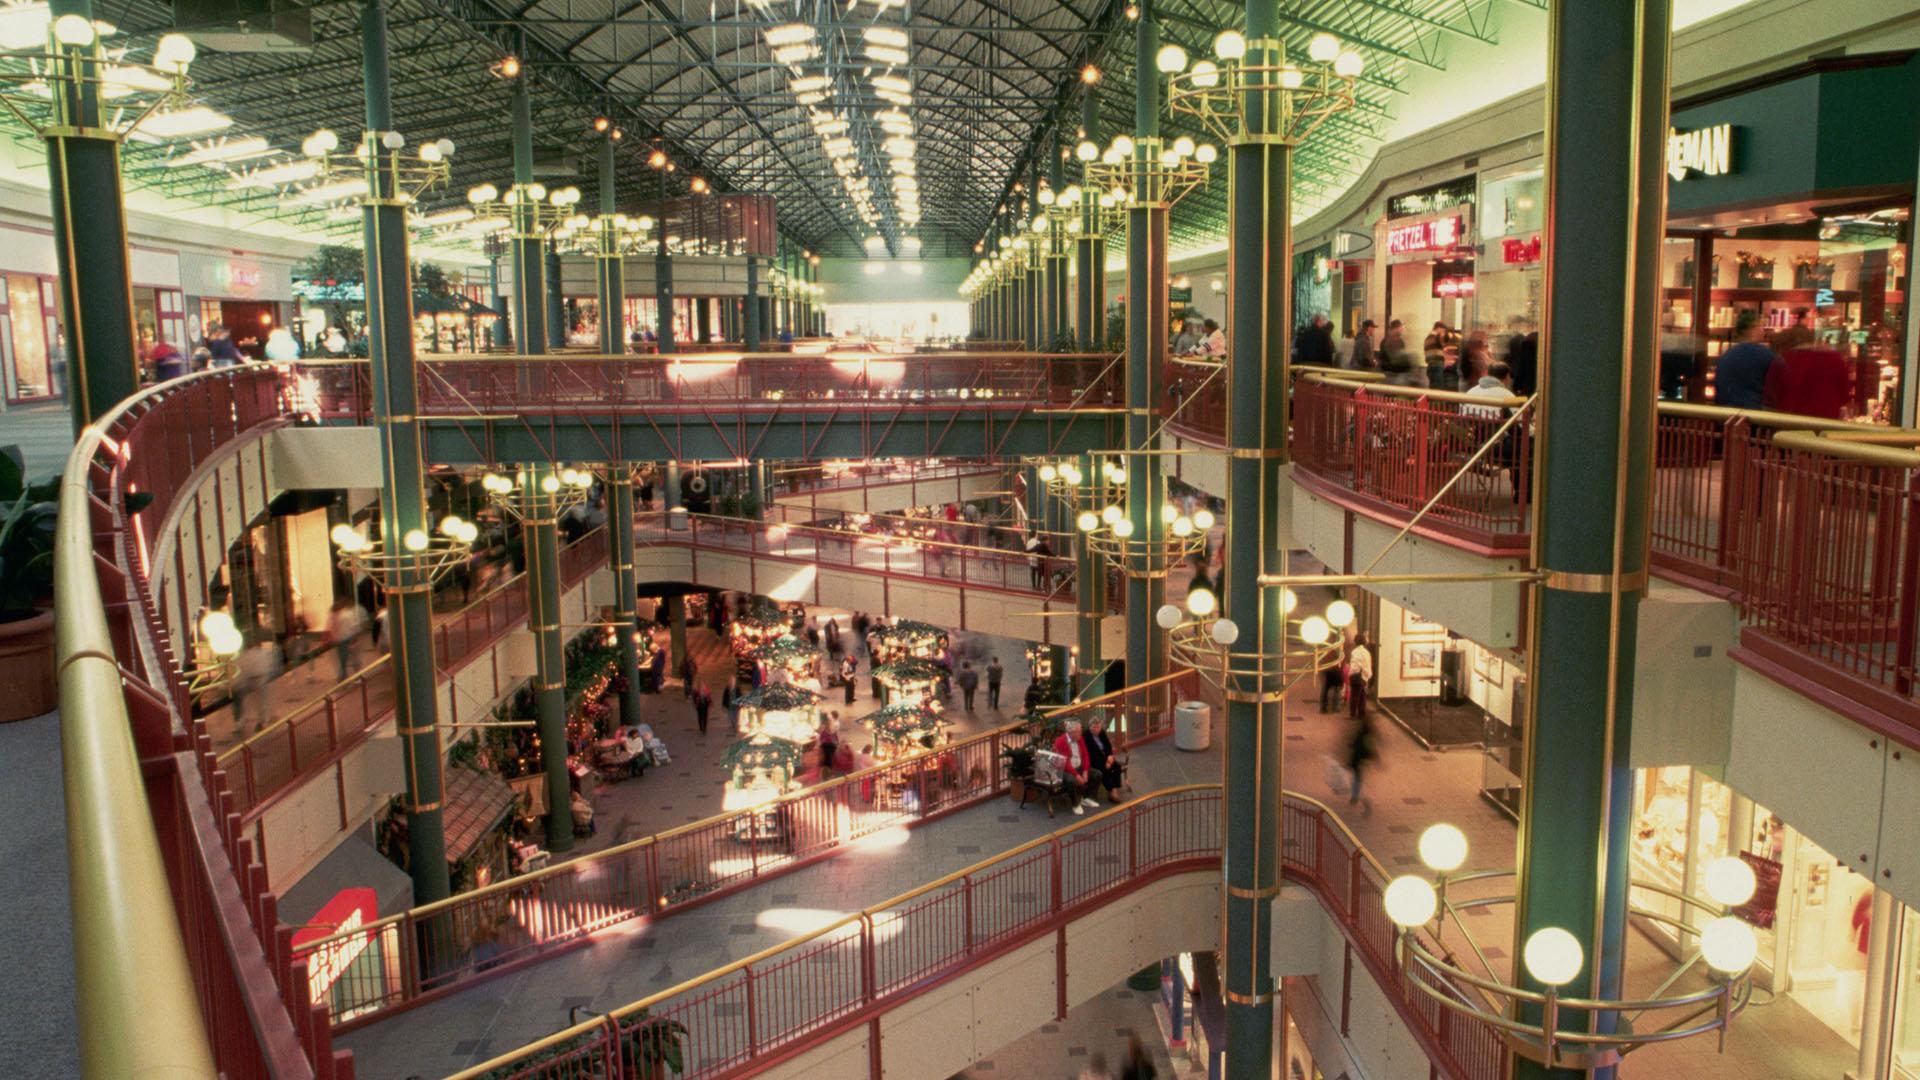 08 Southdale Mall, Victor Gruen, 1956